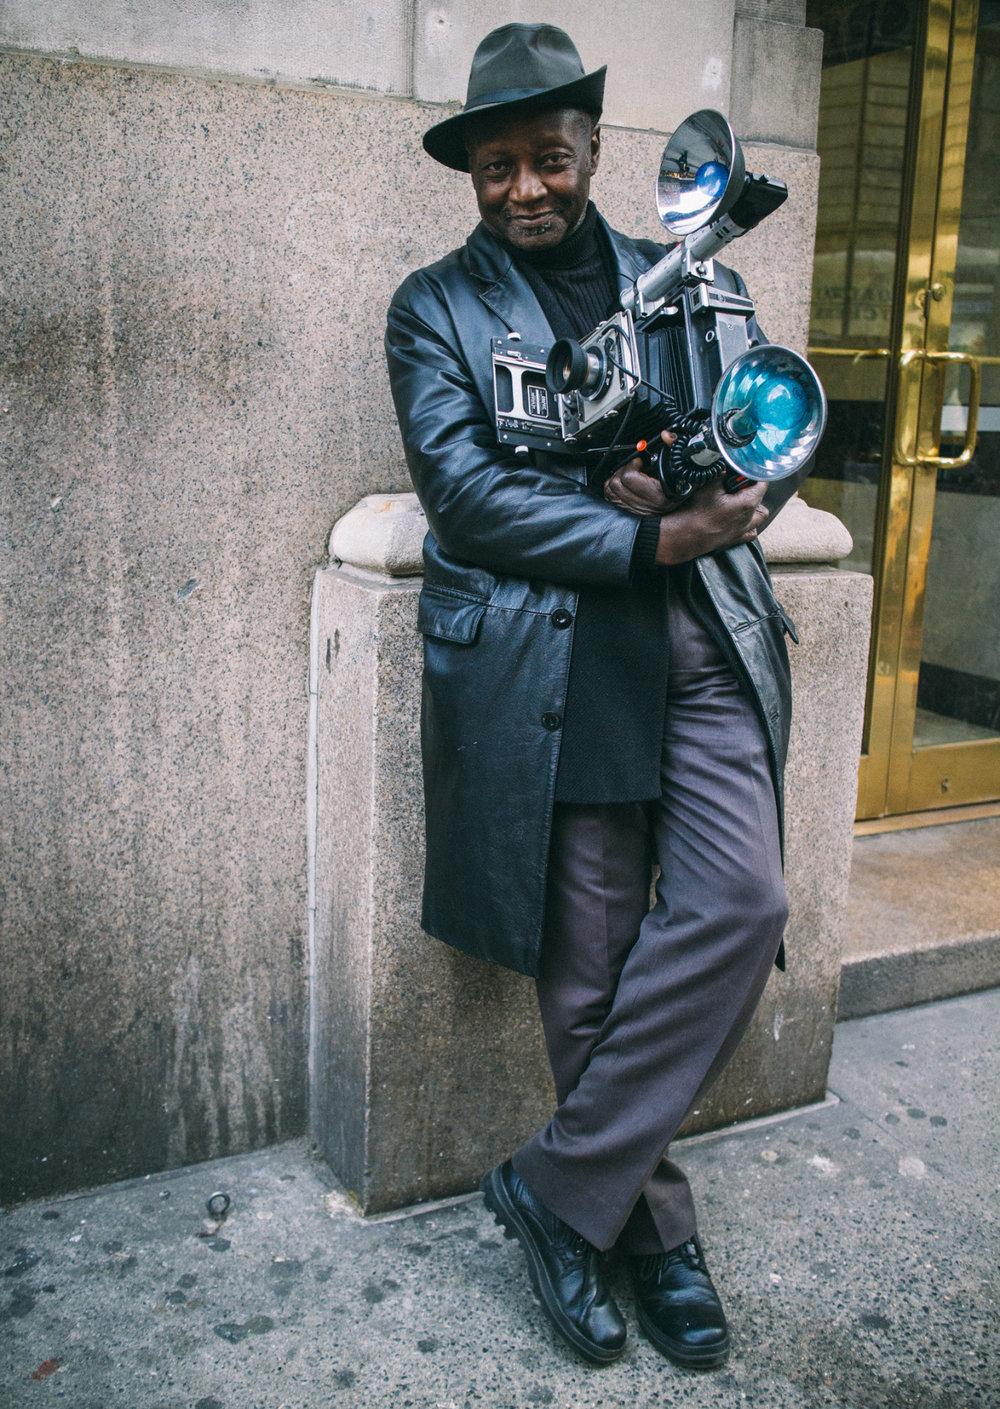 71. Camera Man    www.willoharephotography.com